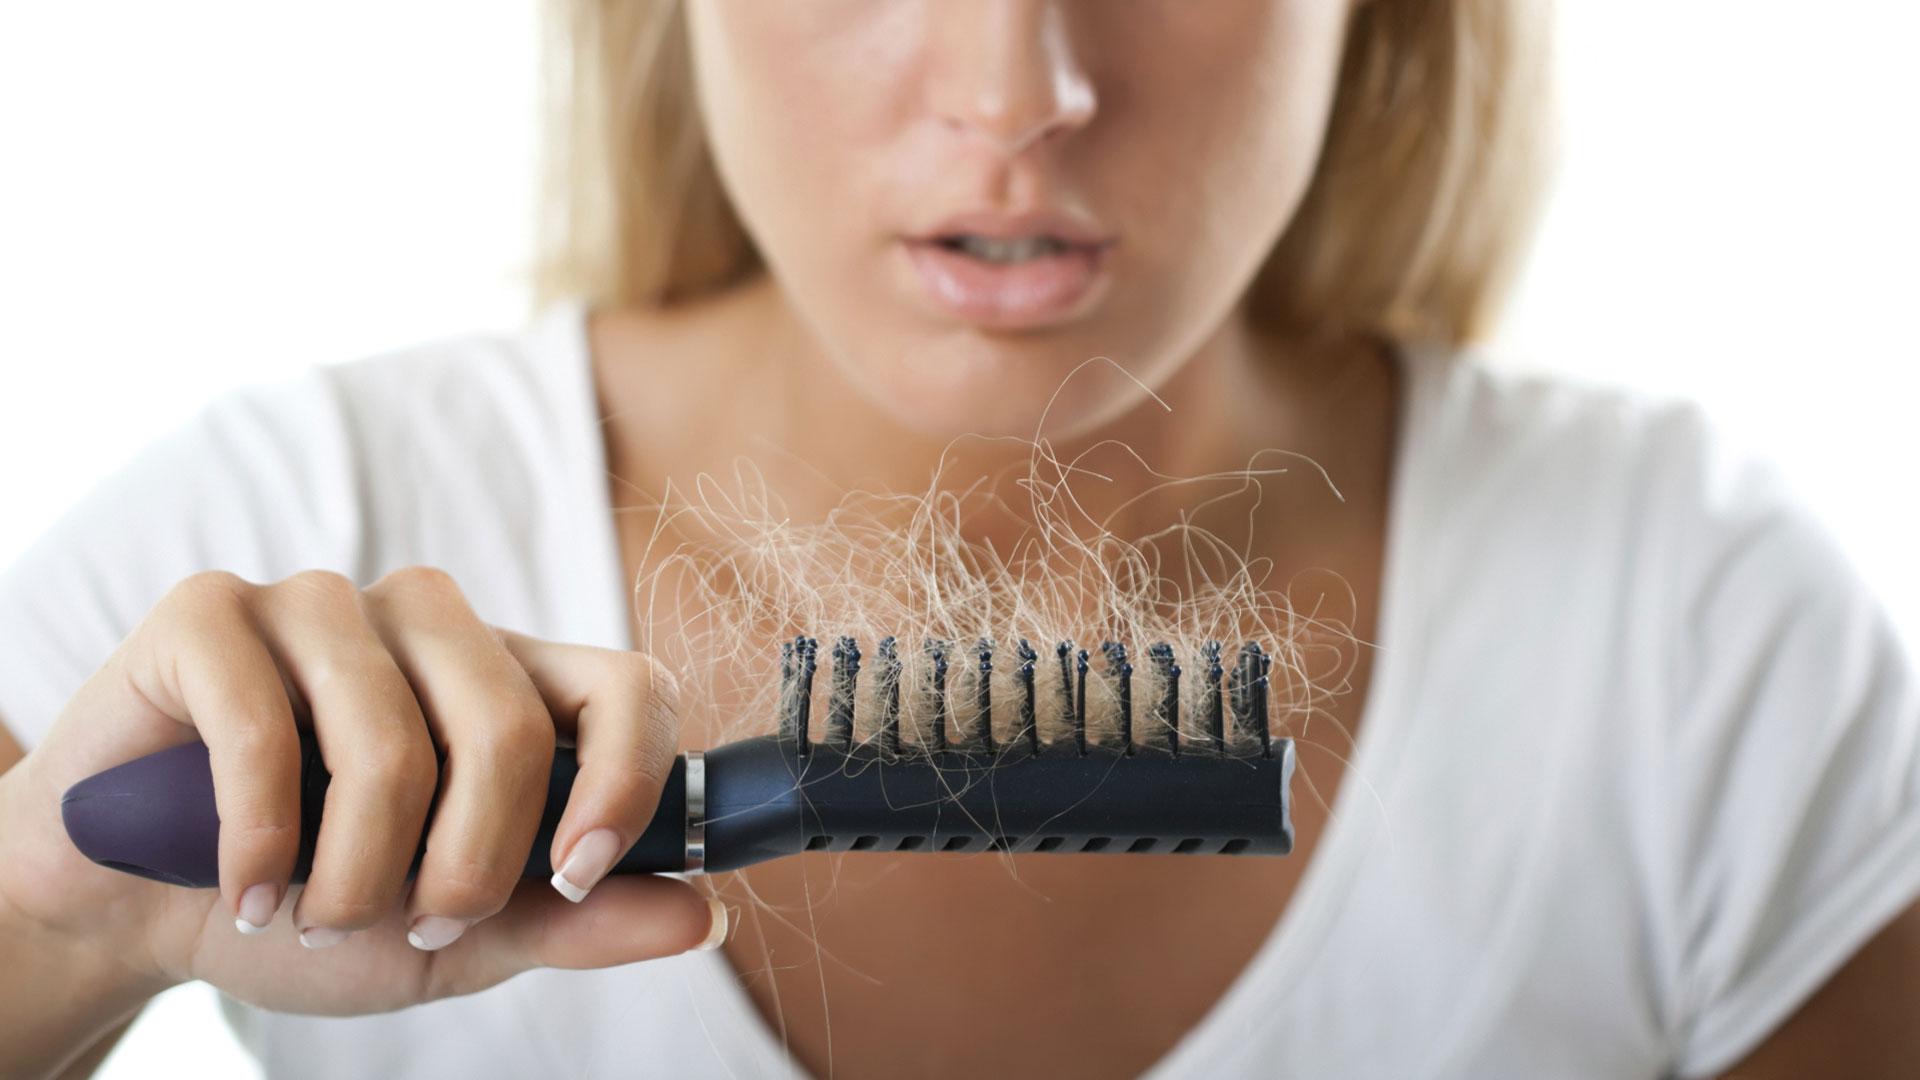 Myrrh-essential-oil-to-prevent-hair-loss